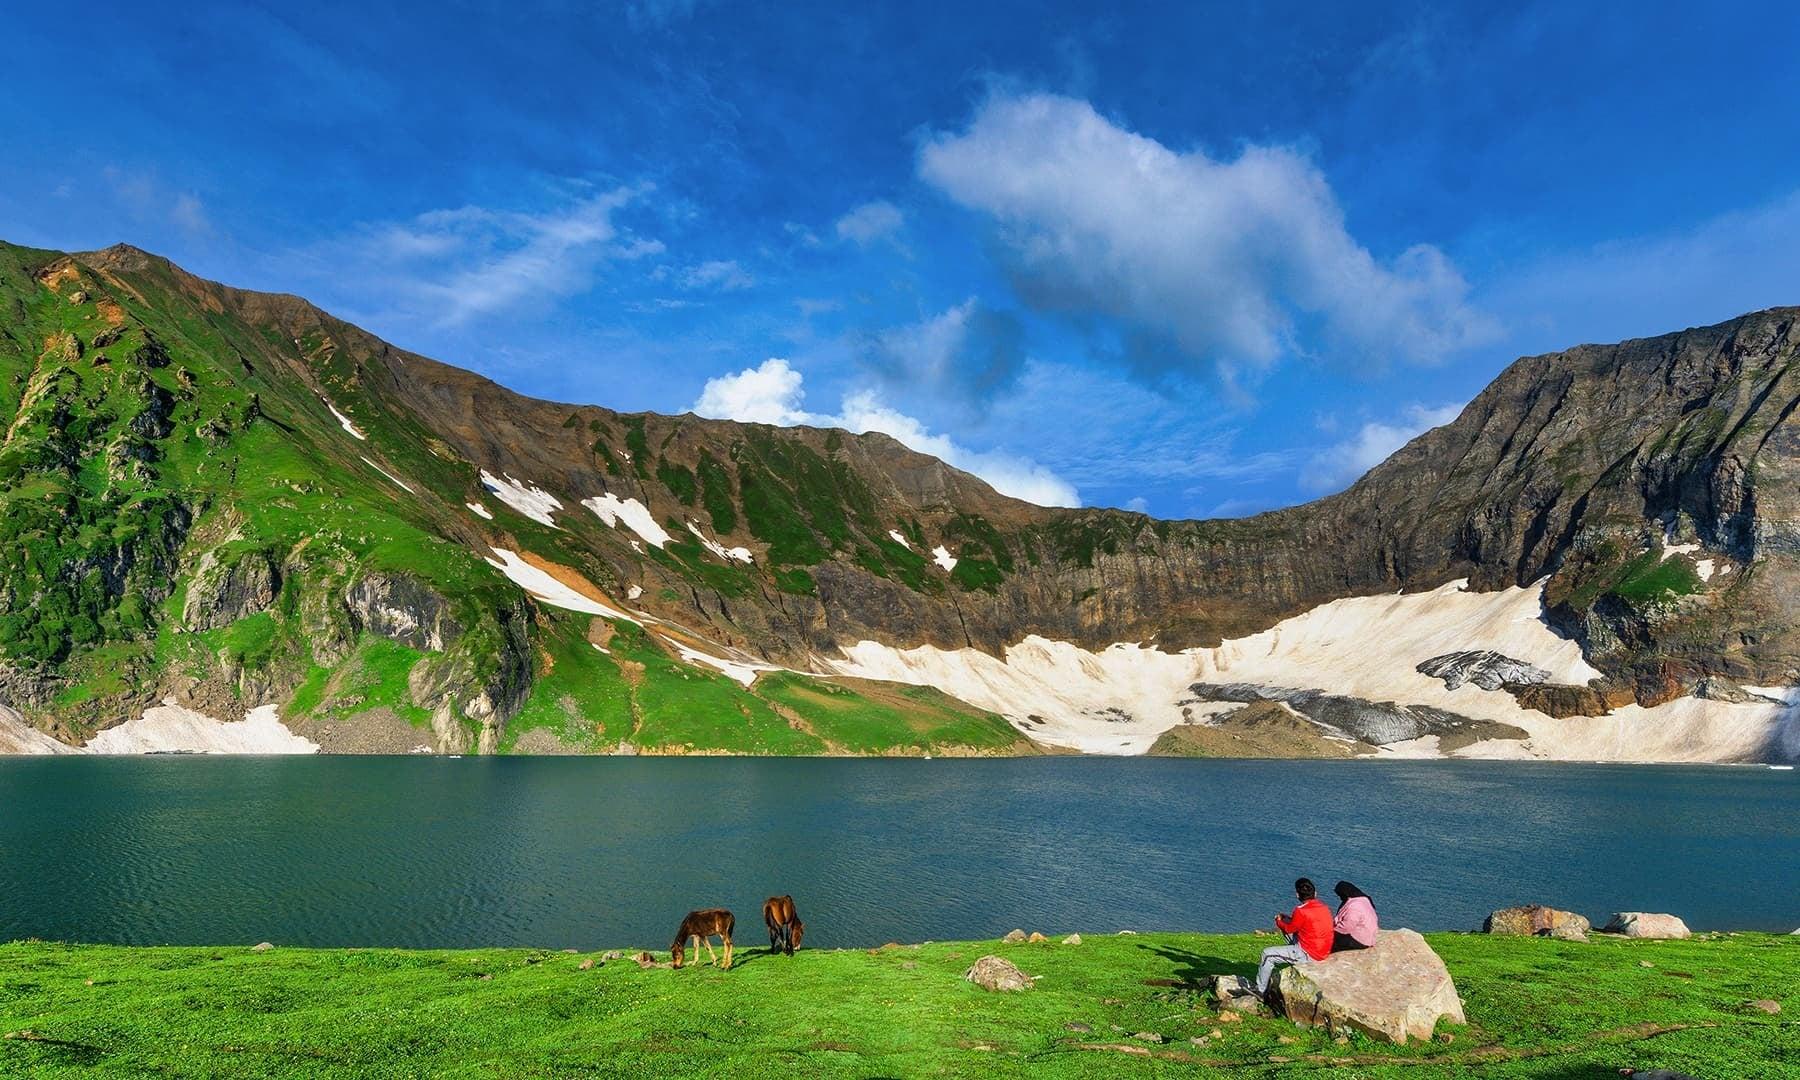 View of Rattigali Lake. — Photo by Syed Mehdi Bukhari